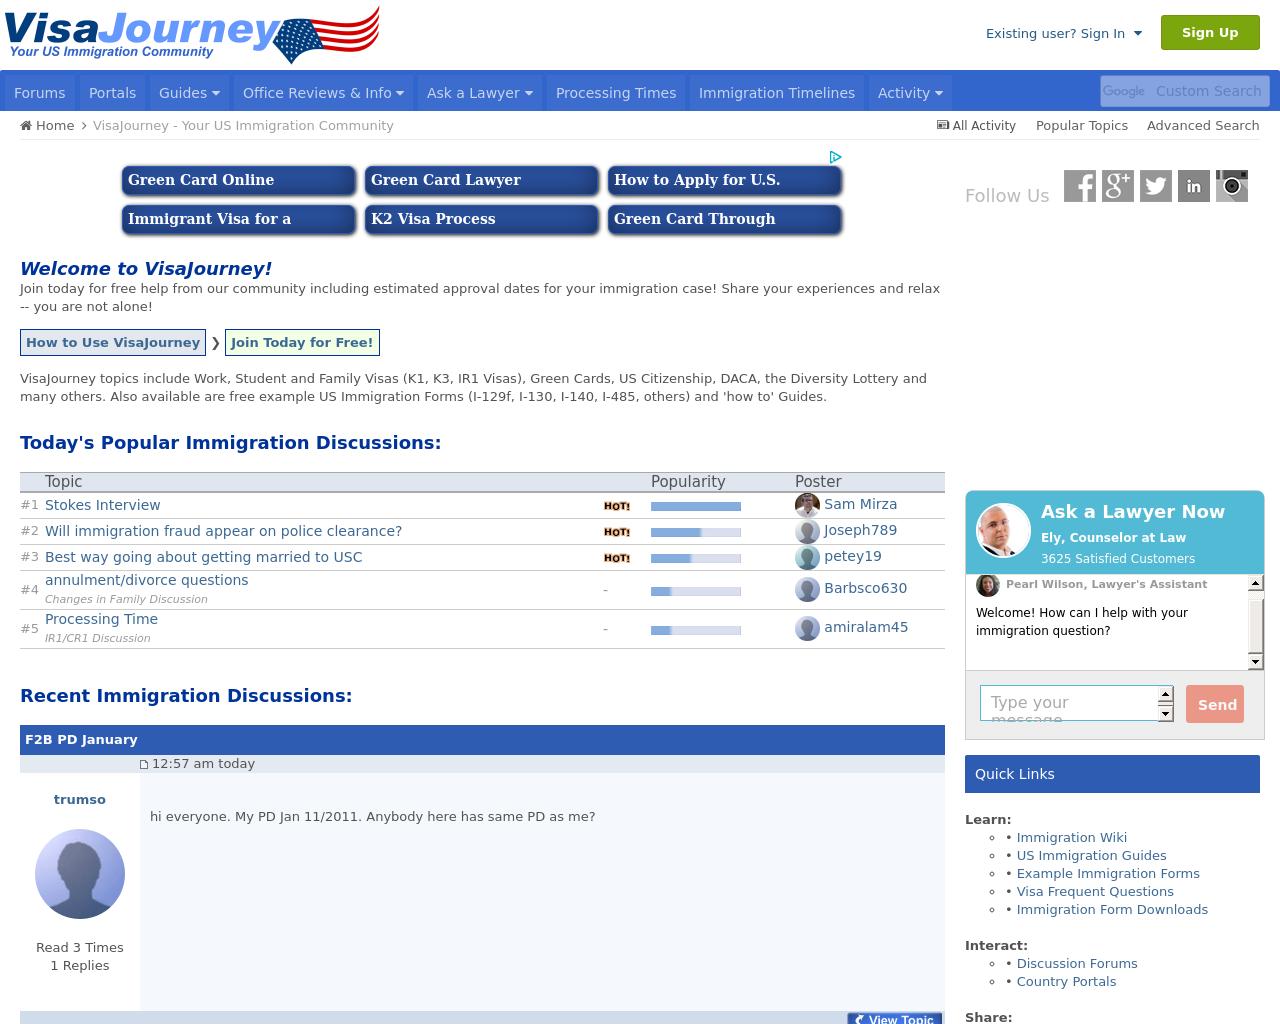 VisaJourney-Advertising-Reviews-Pricing